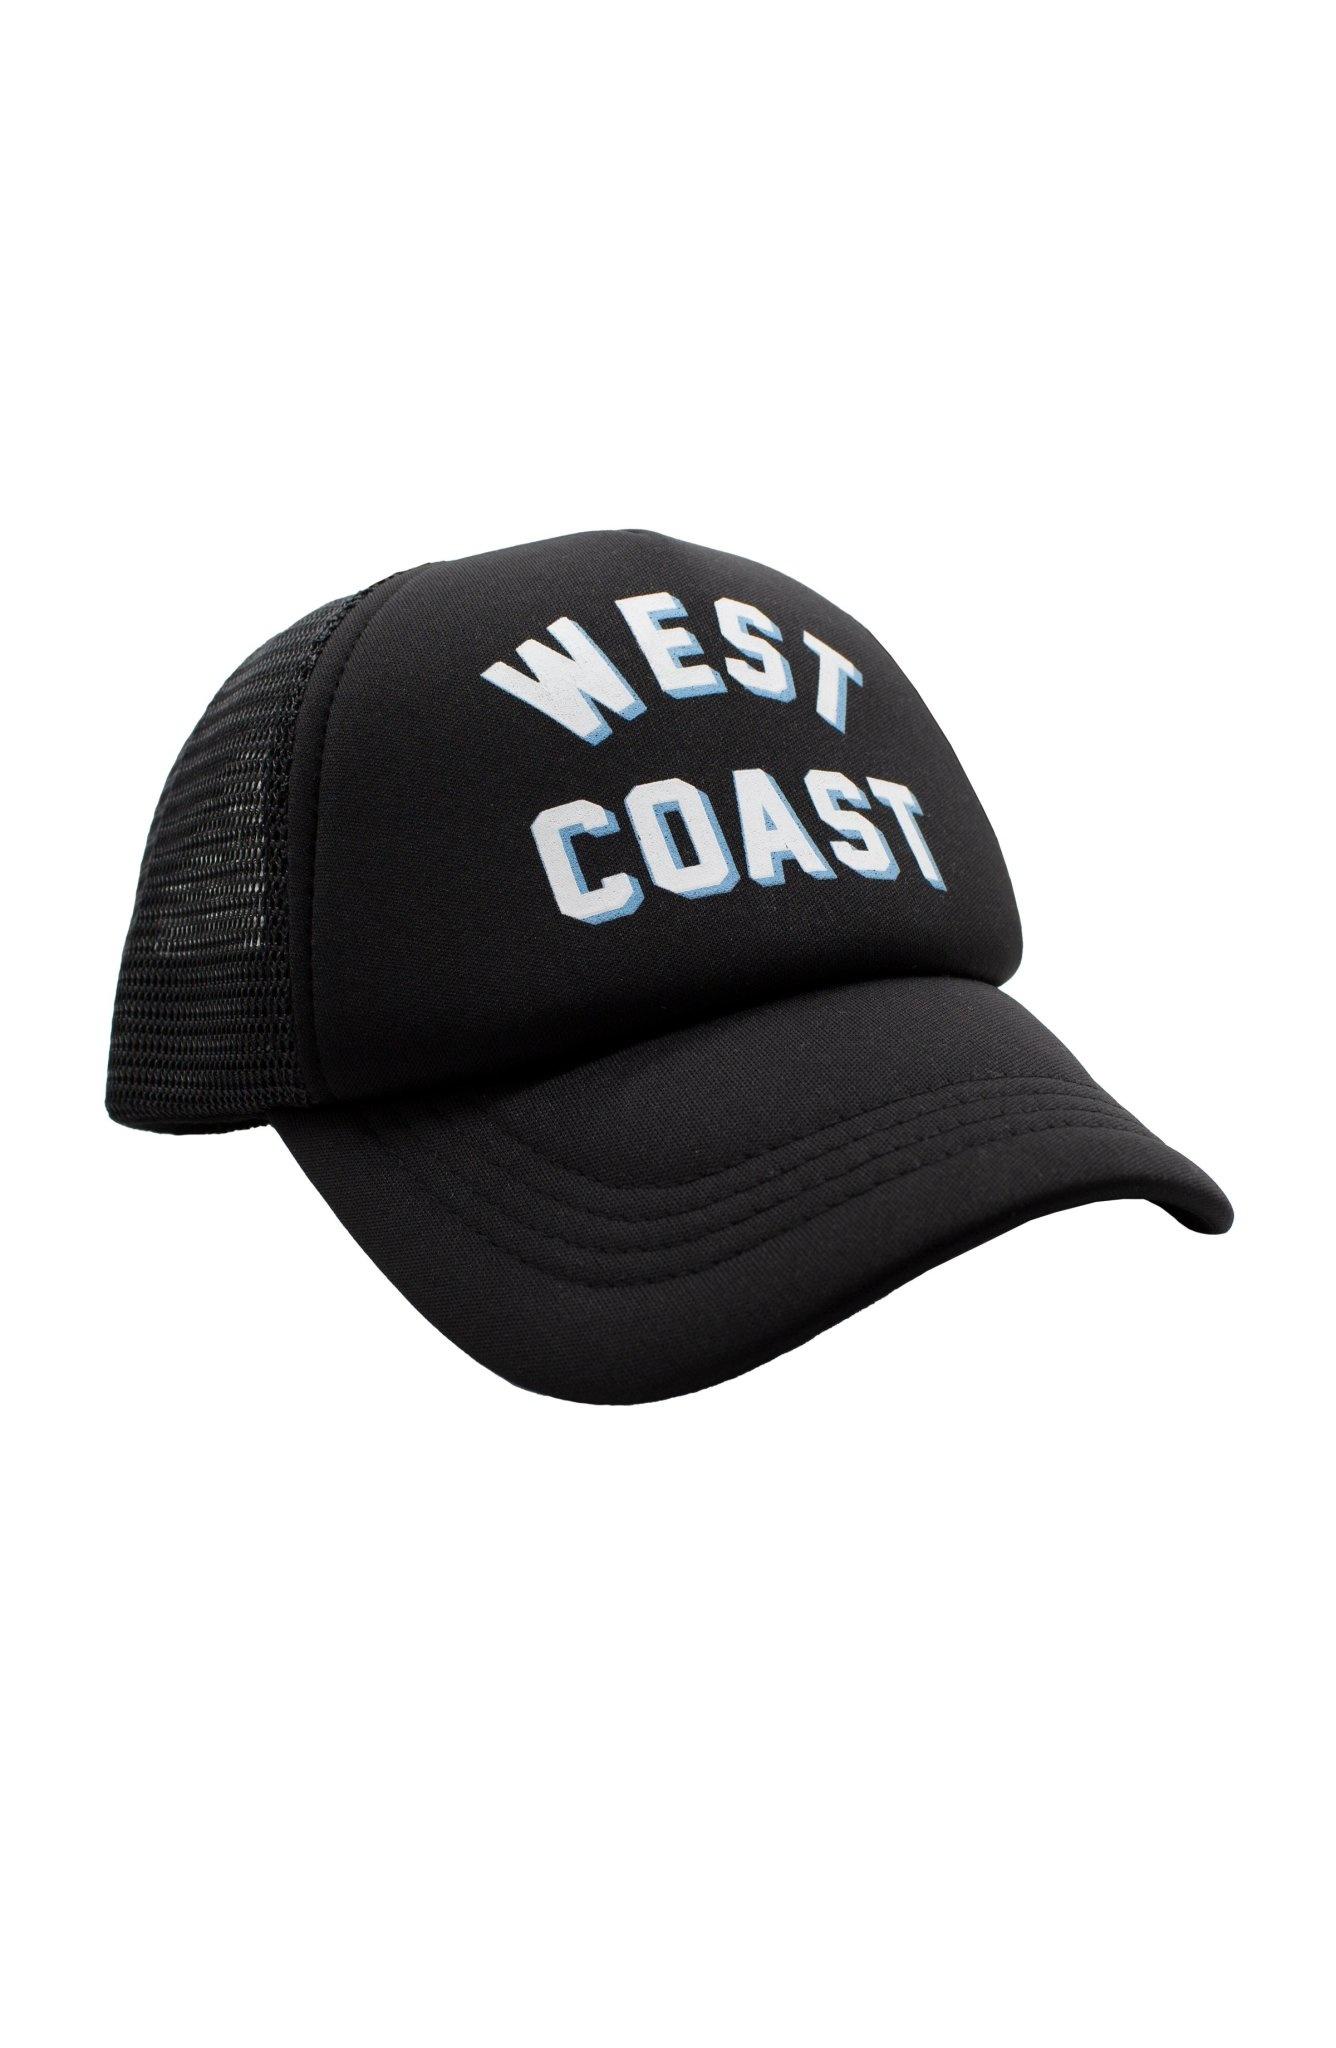 Feather 4 Arrow West Coast Hat